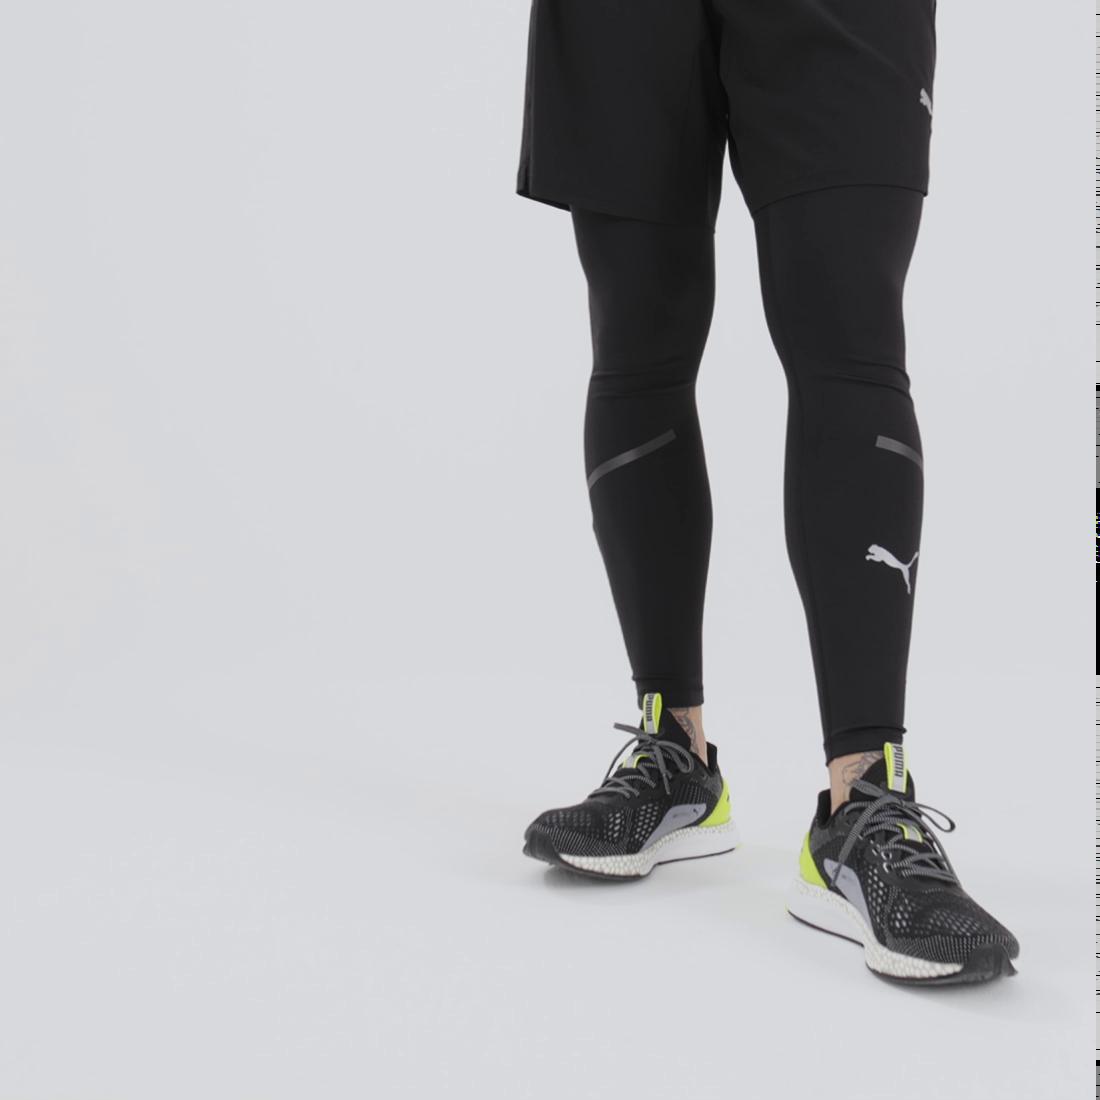 Imagen PUMA Calzas largas de running Runner ID para hombre #8